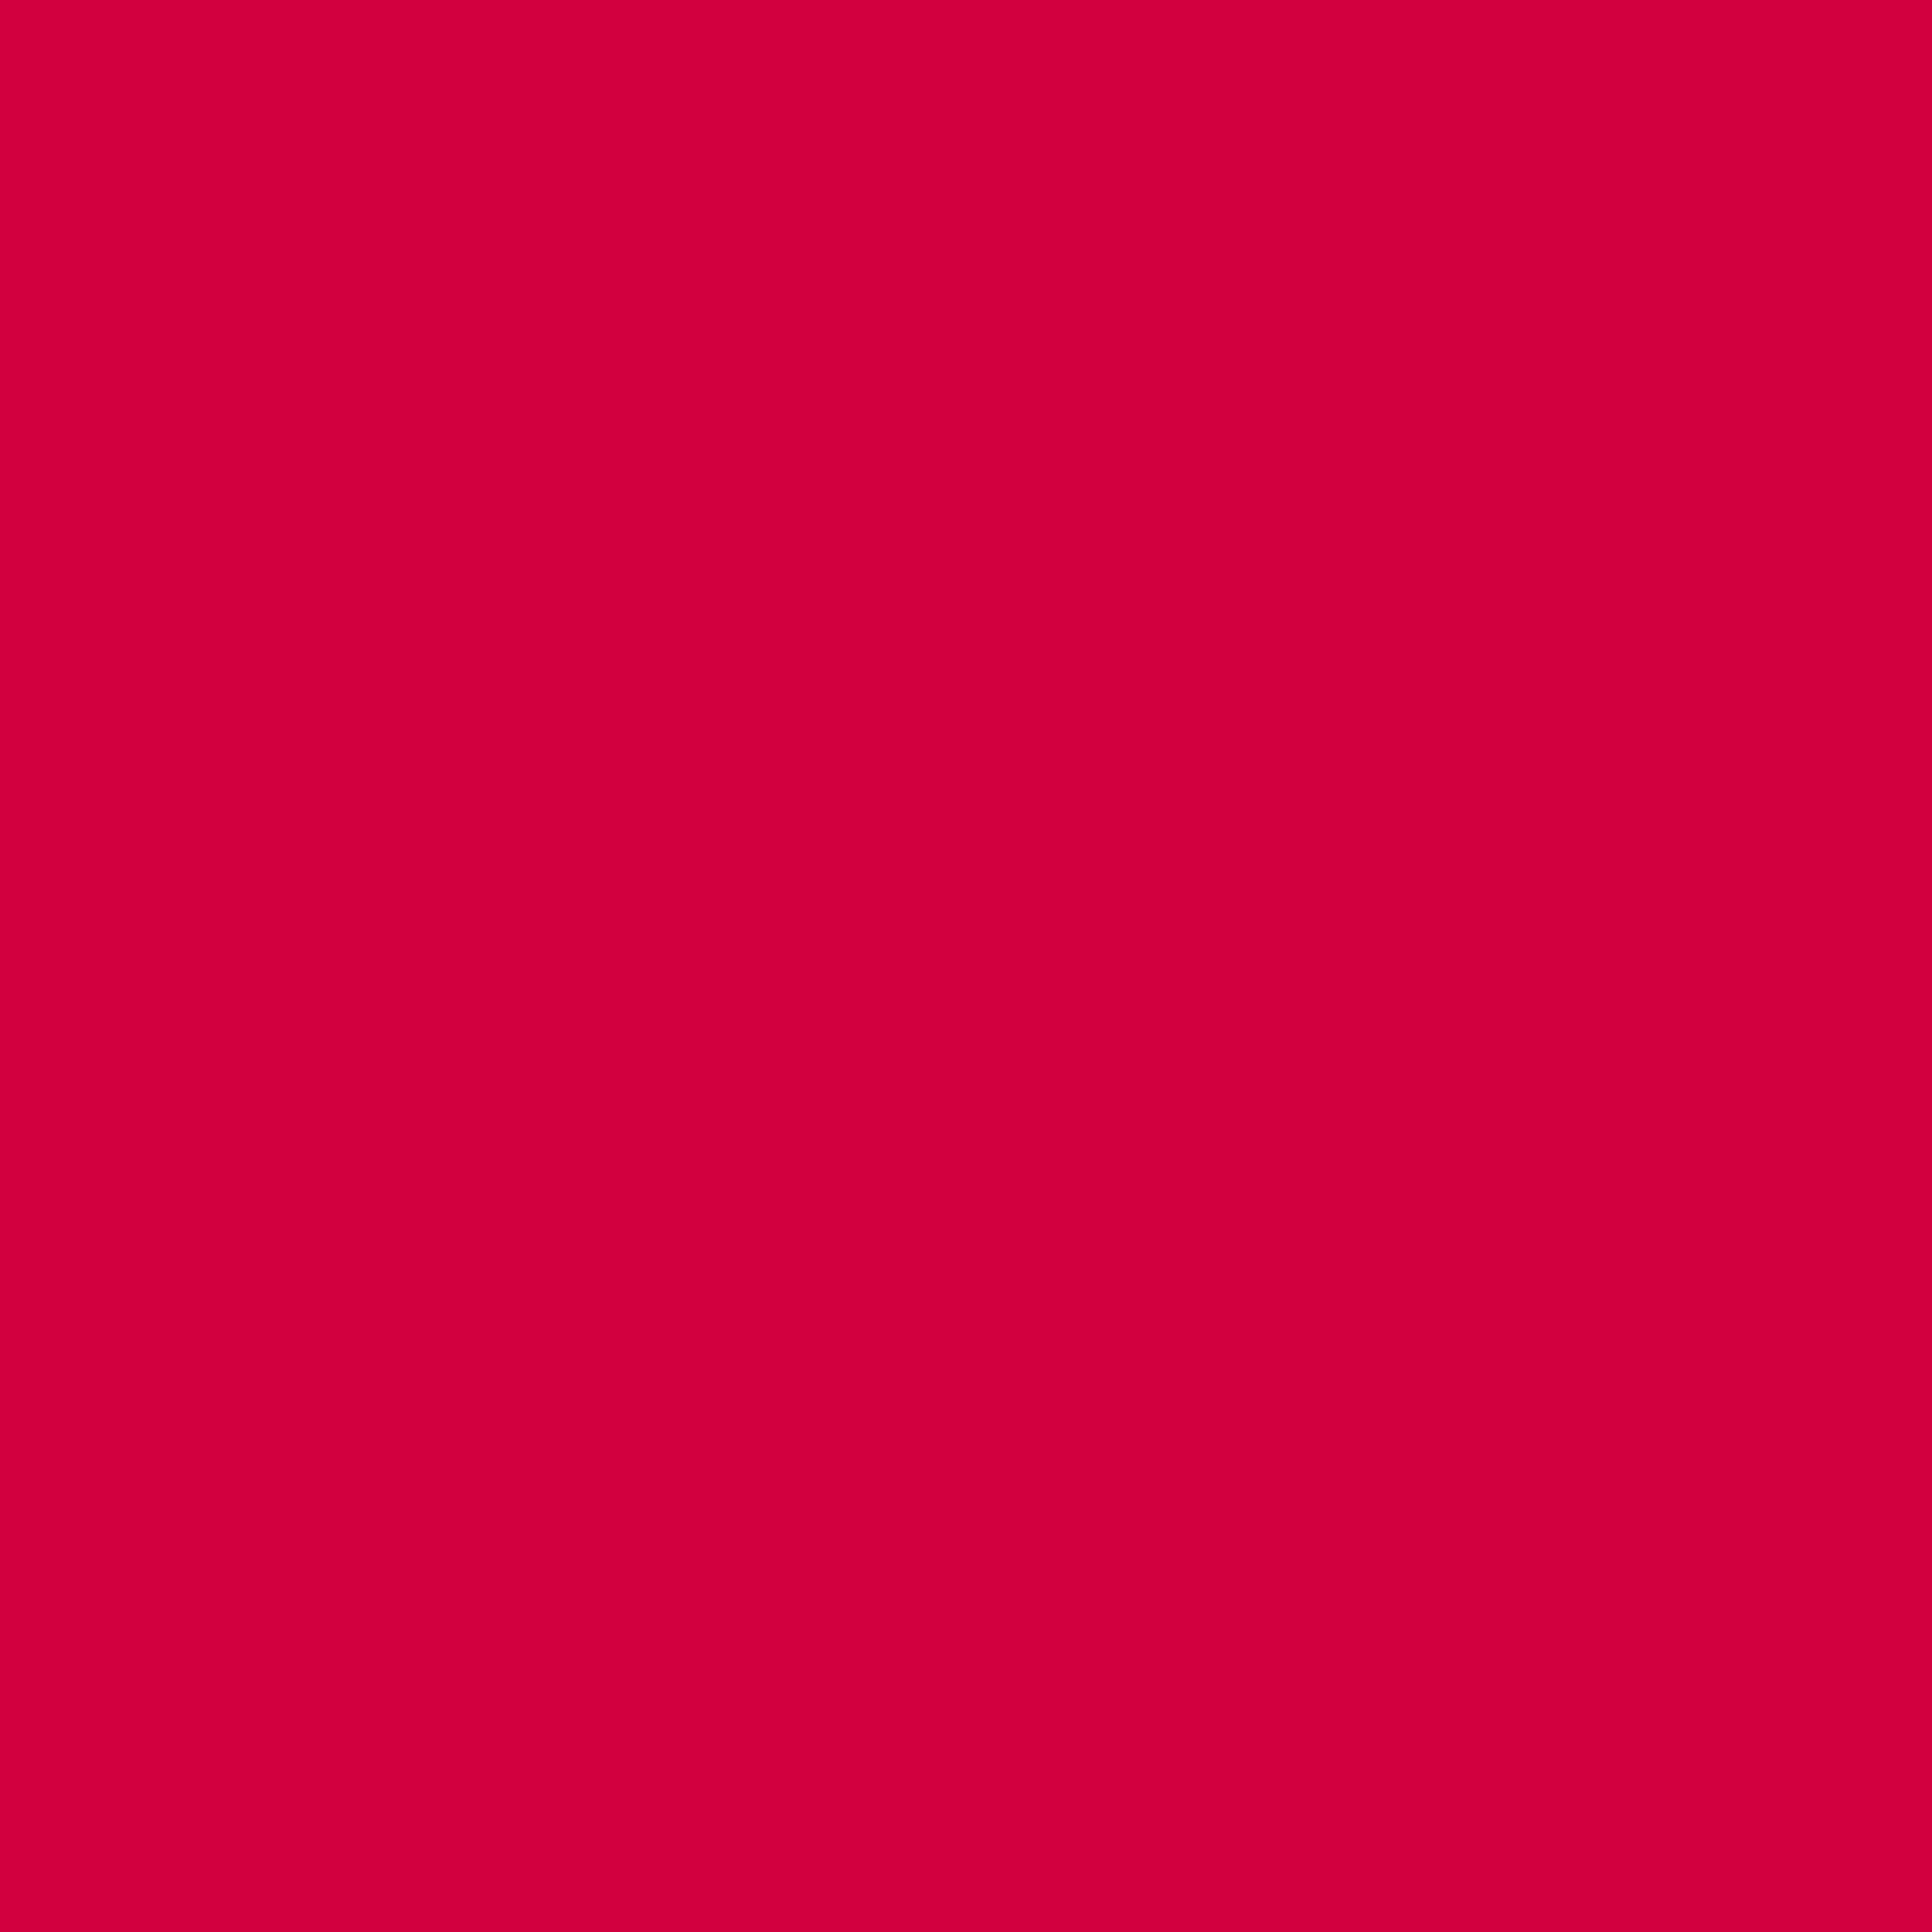 2732x2732 Utah Crimson Solid Color Background